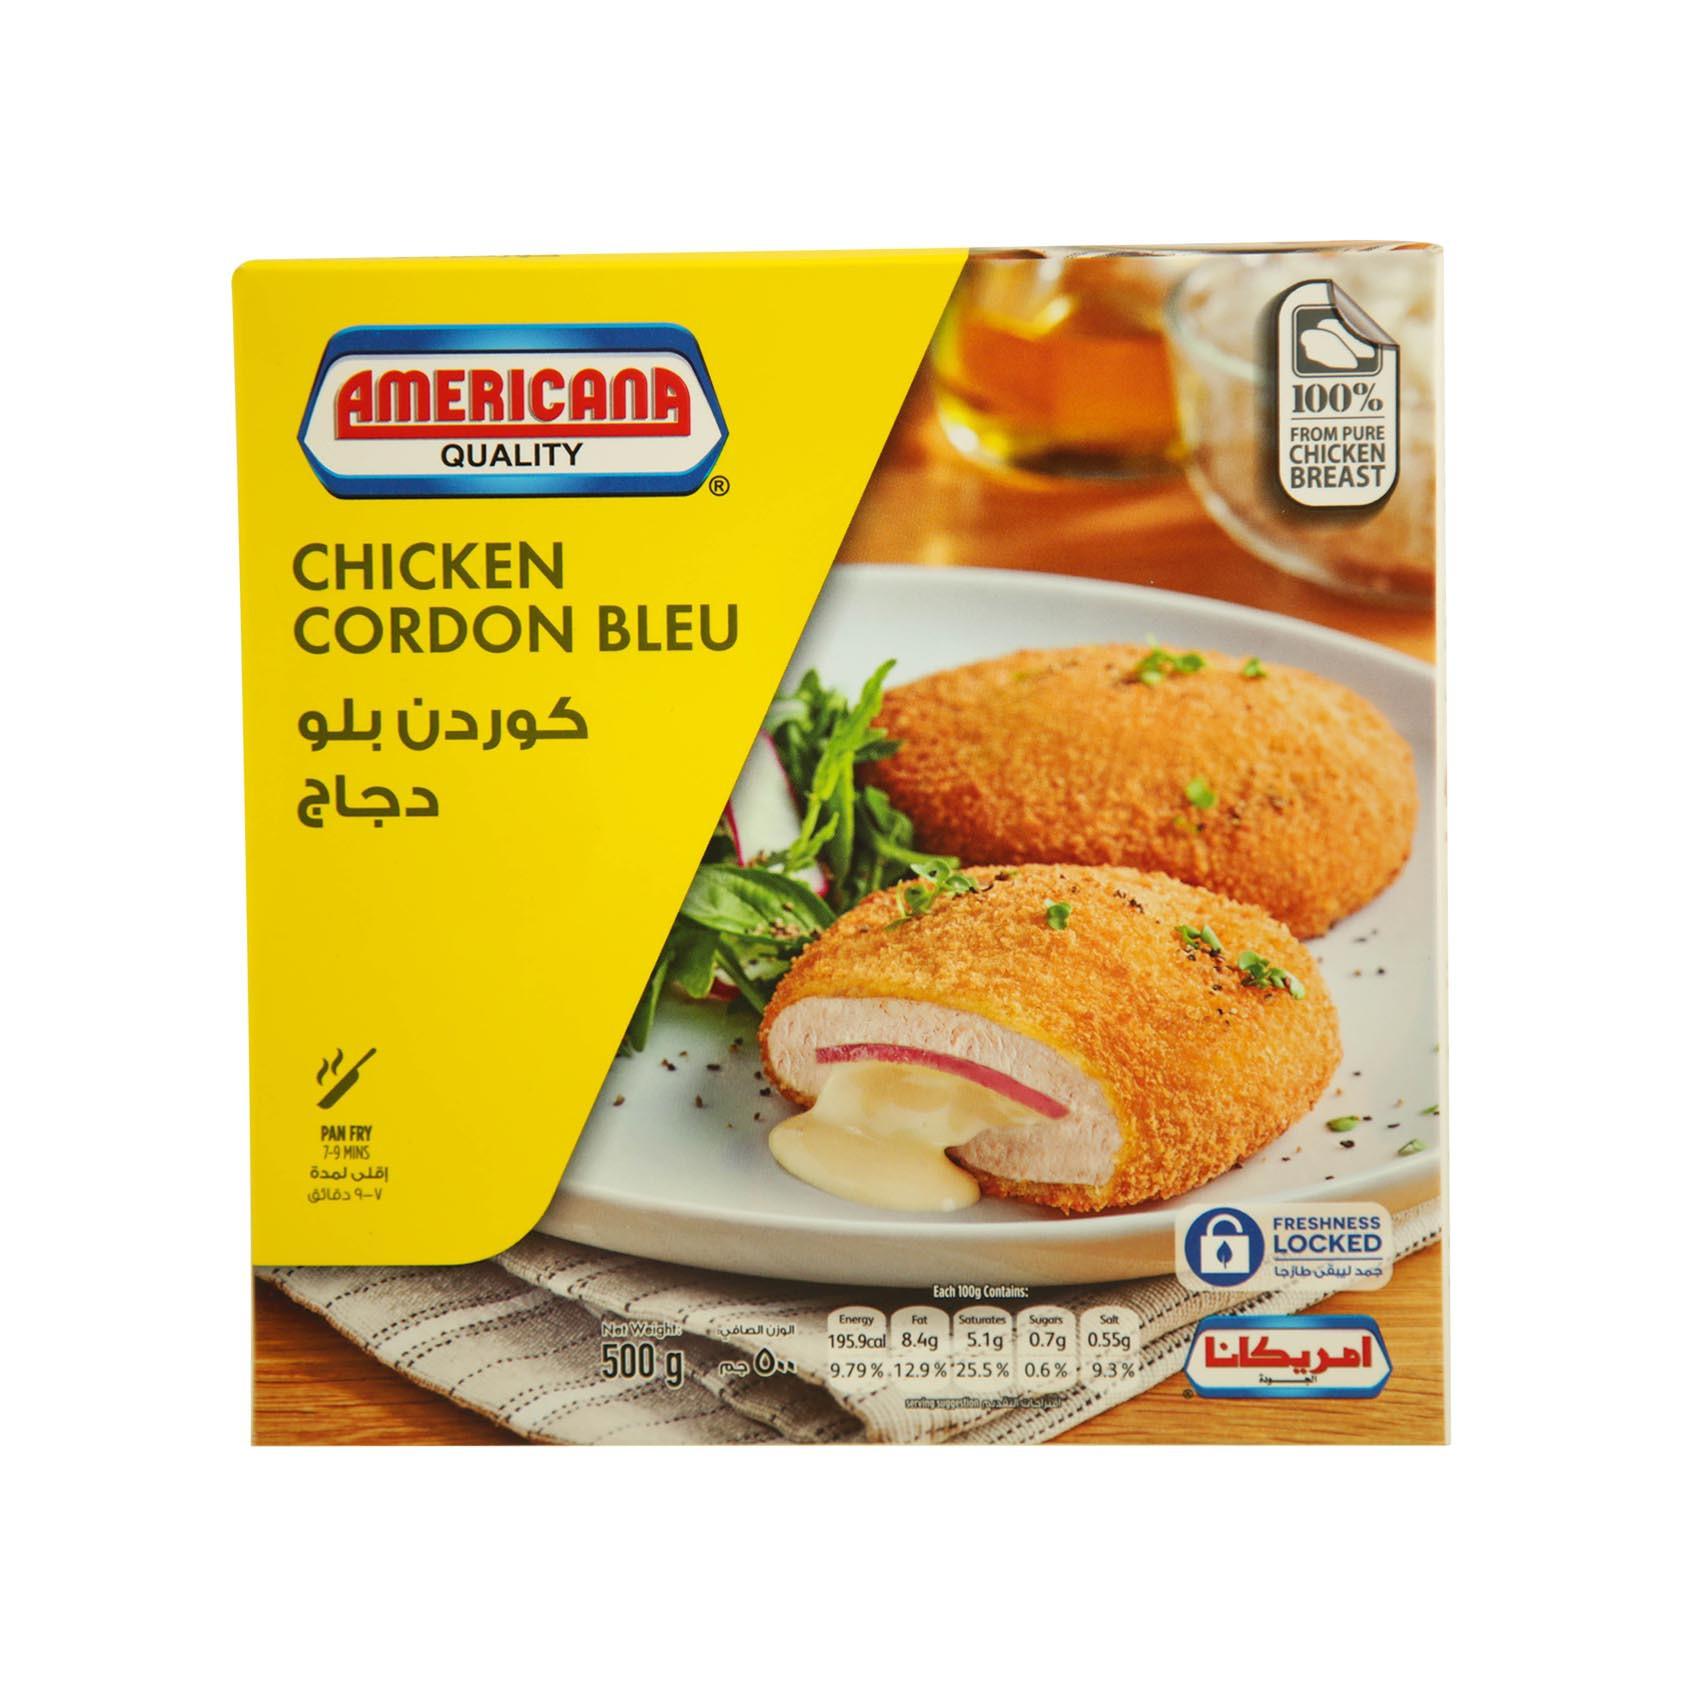 Buy Americana Chicken Cordon Bleu 500g Online Shop Frozen Food On Carrefour Uae